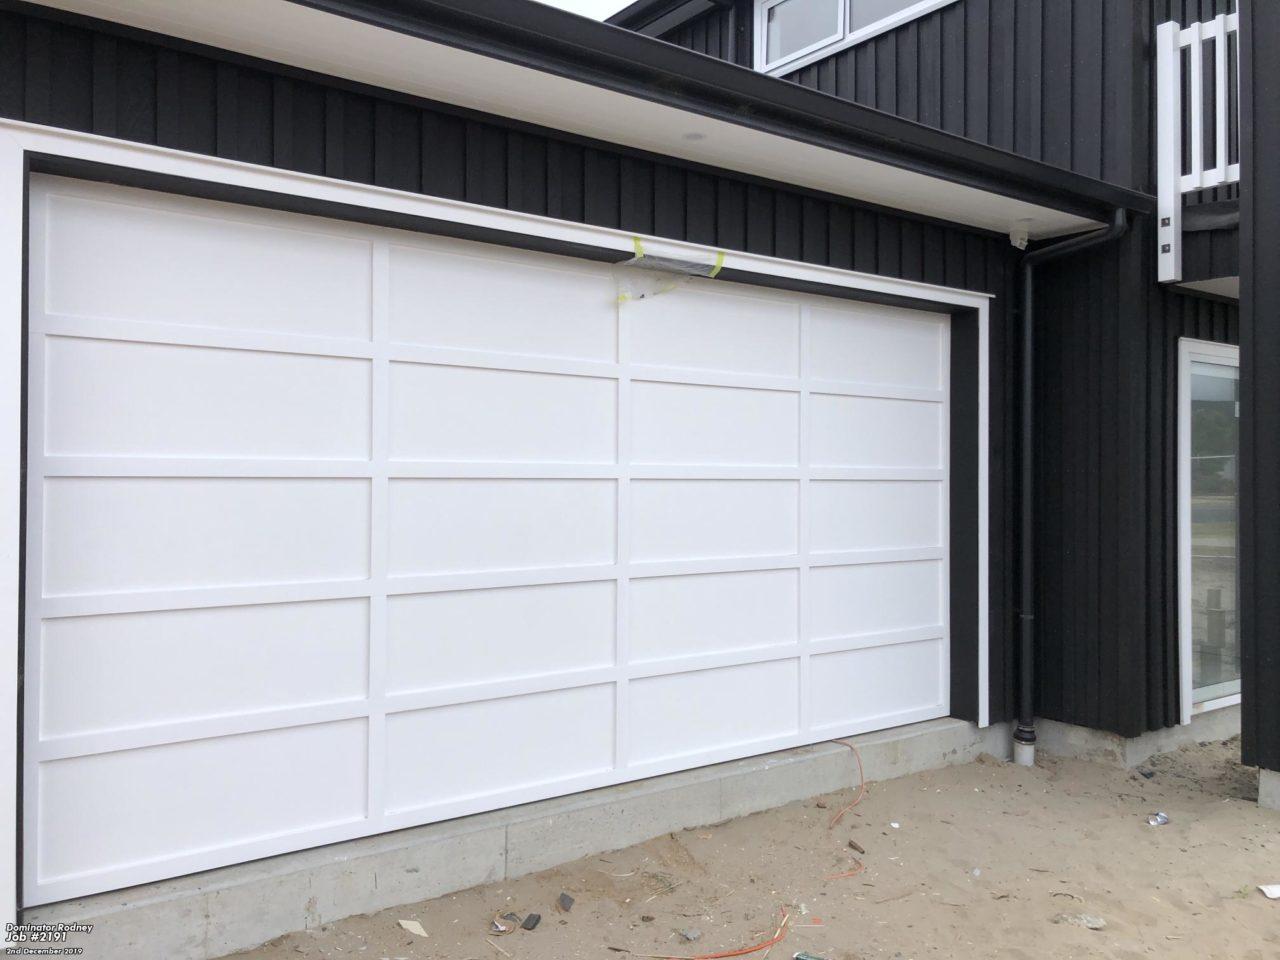 Painted Plywood and Batten Sectional Garage Door